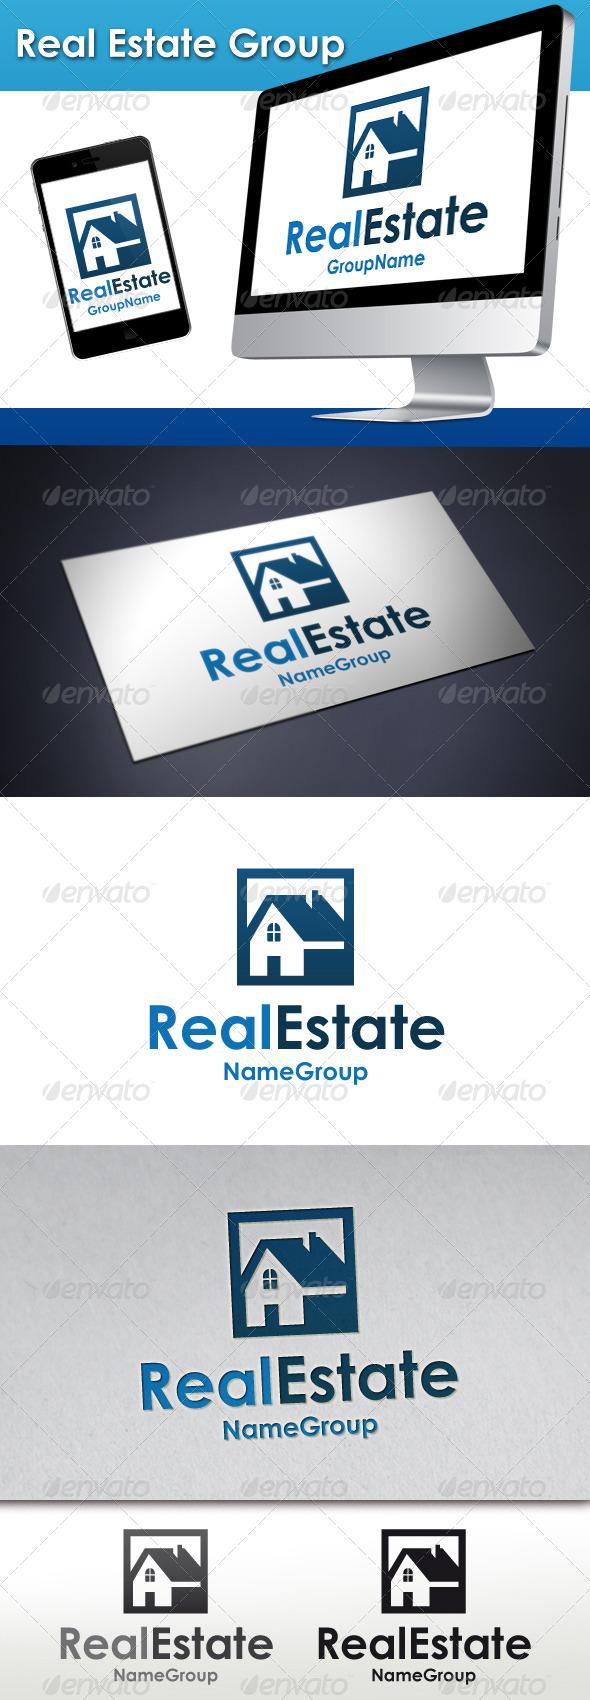 GraphicRiver Real Estate Group Logo 3408958